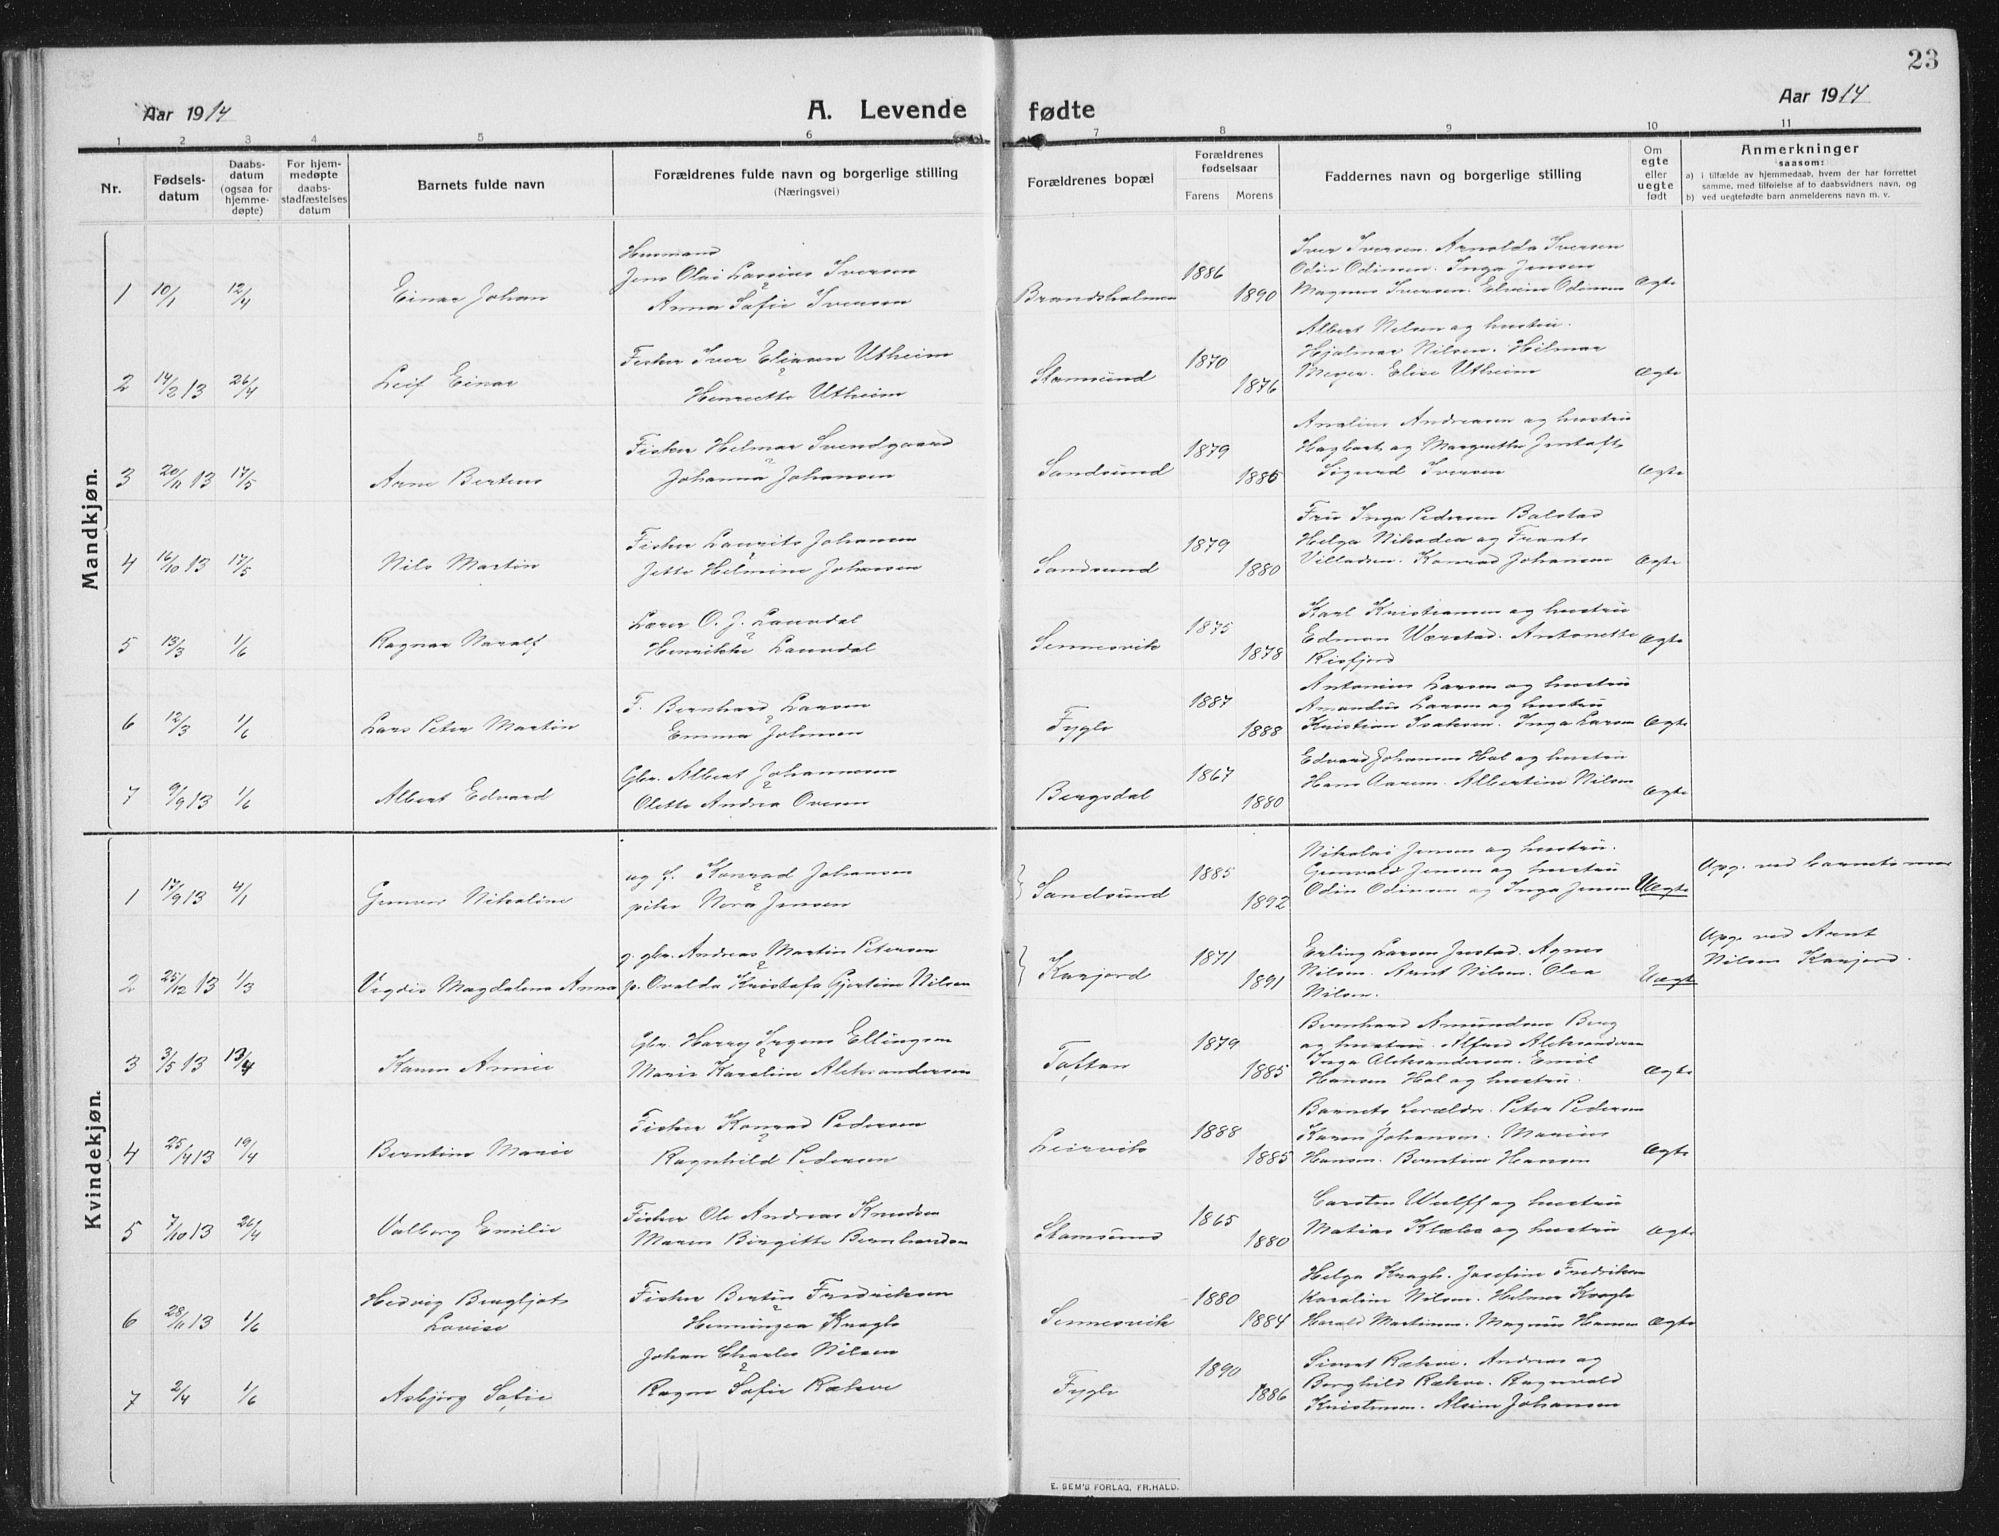 SAT, Ministerialprotokoller, klokkerbøker og fødselsregistre - Nordland, 882/L1183: Klokkerbok nr. 882C01, 1911-1938, s. 23